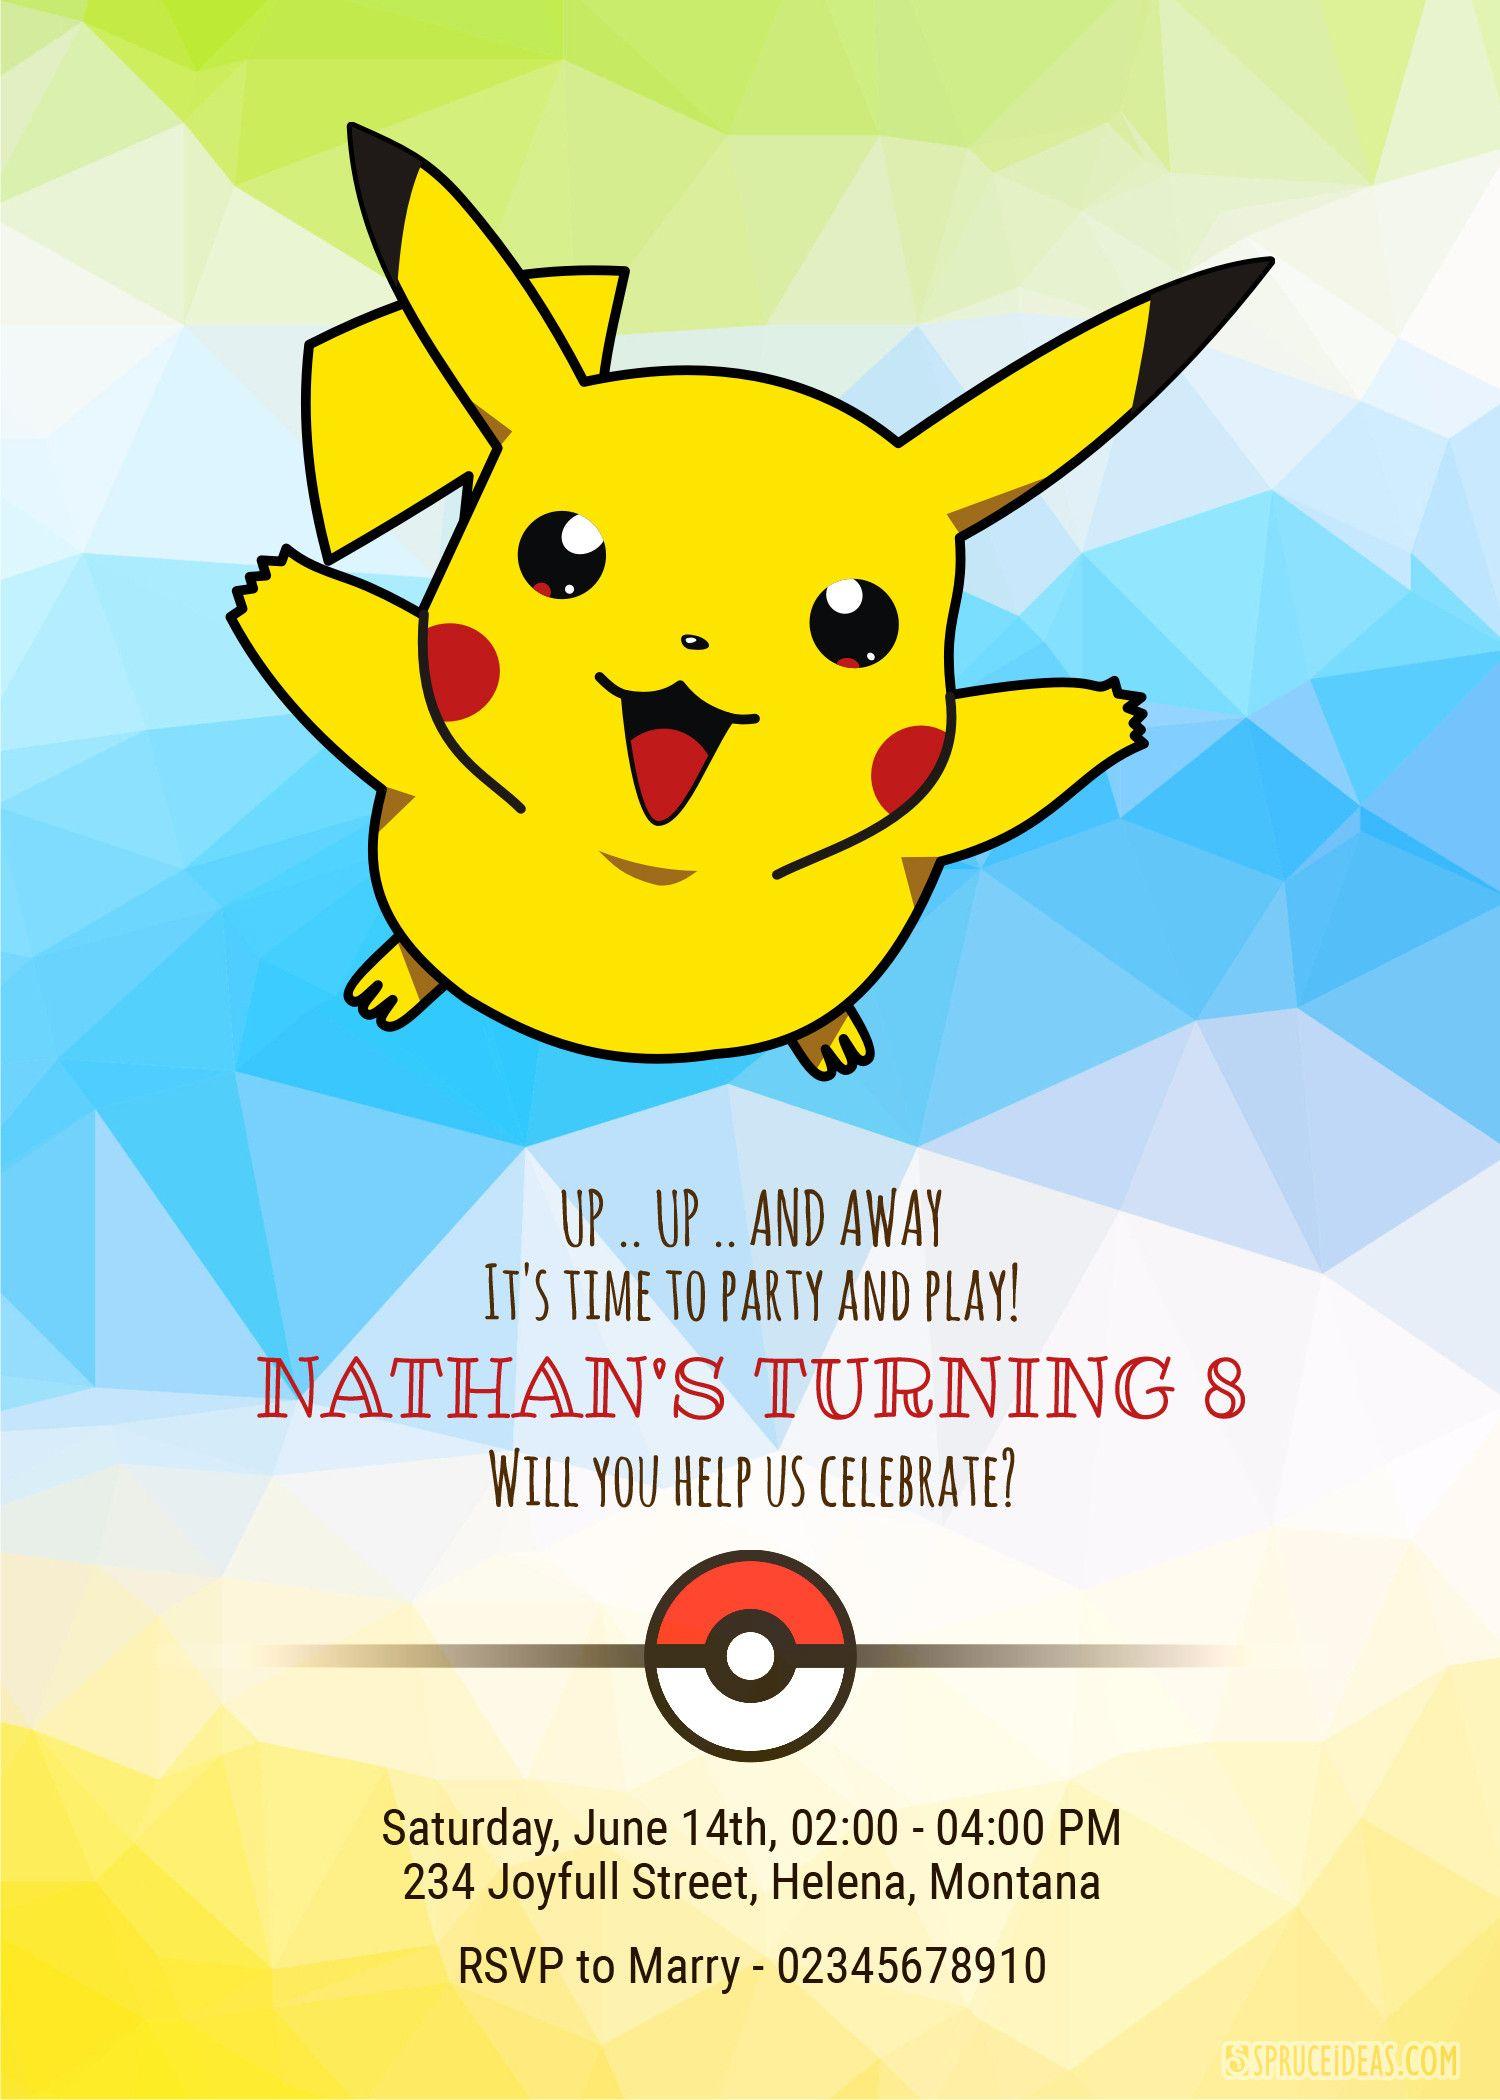 Pokemon Invitation Template Free Awesome 99 Pokemon Card Birthday Invitations Template Pokem Pokemon Invitations Pokemon Birthday Birthday Invitation Templates